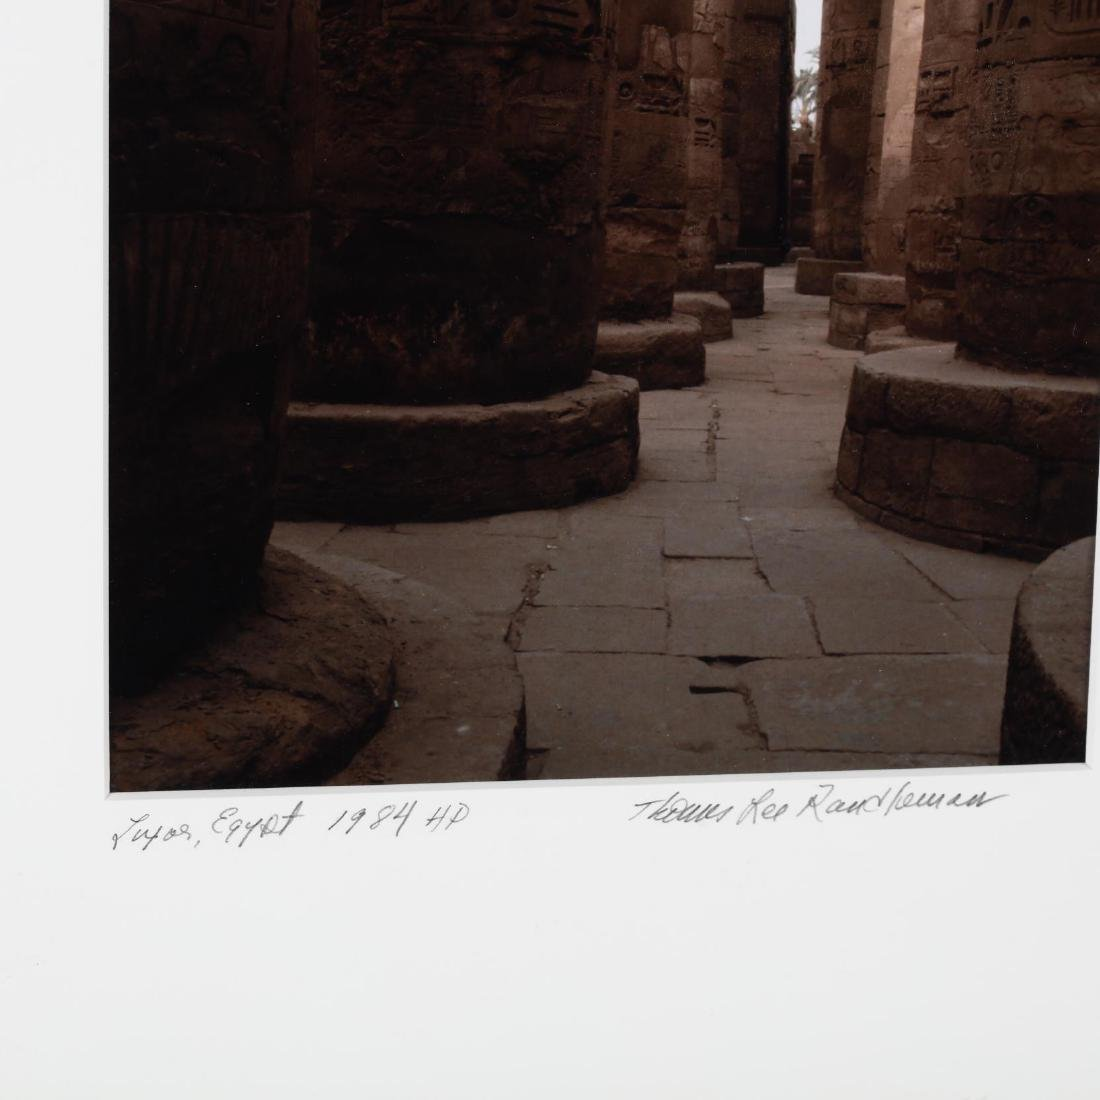 Thomas Lee Randleman (OH, 20th/21st Century),  Luxor, - 2